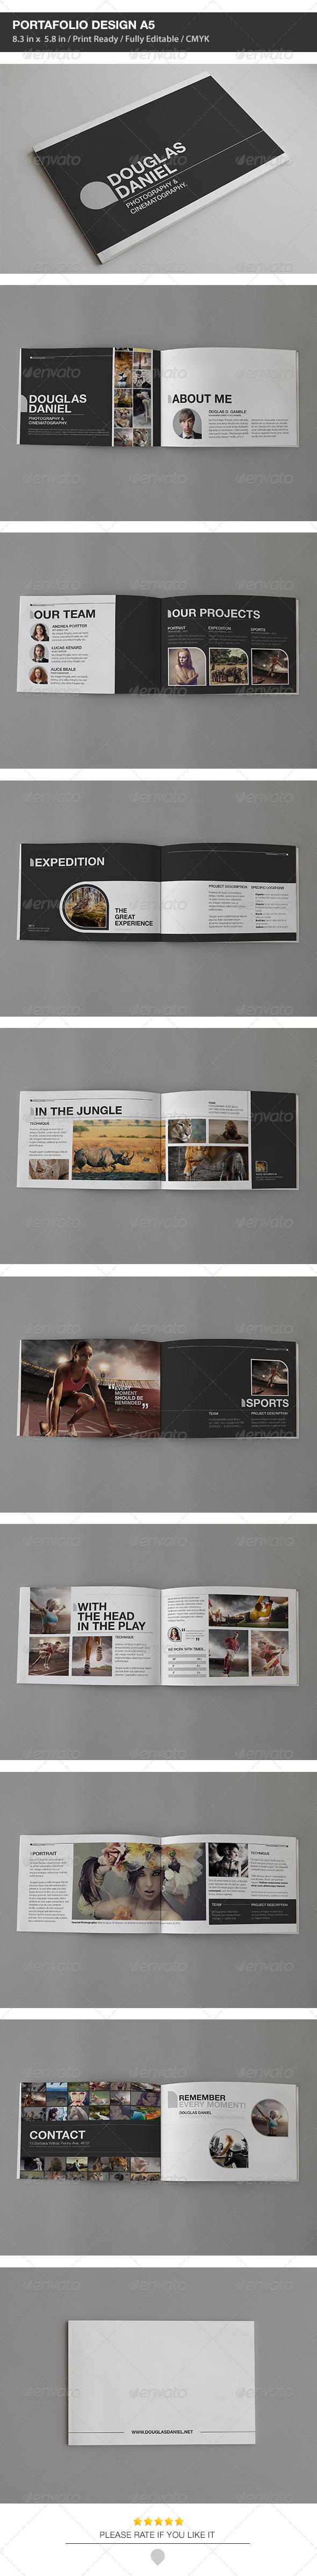 DD Portfolio Design A5